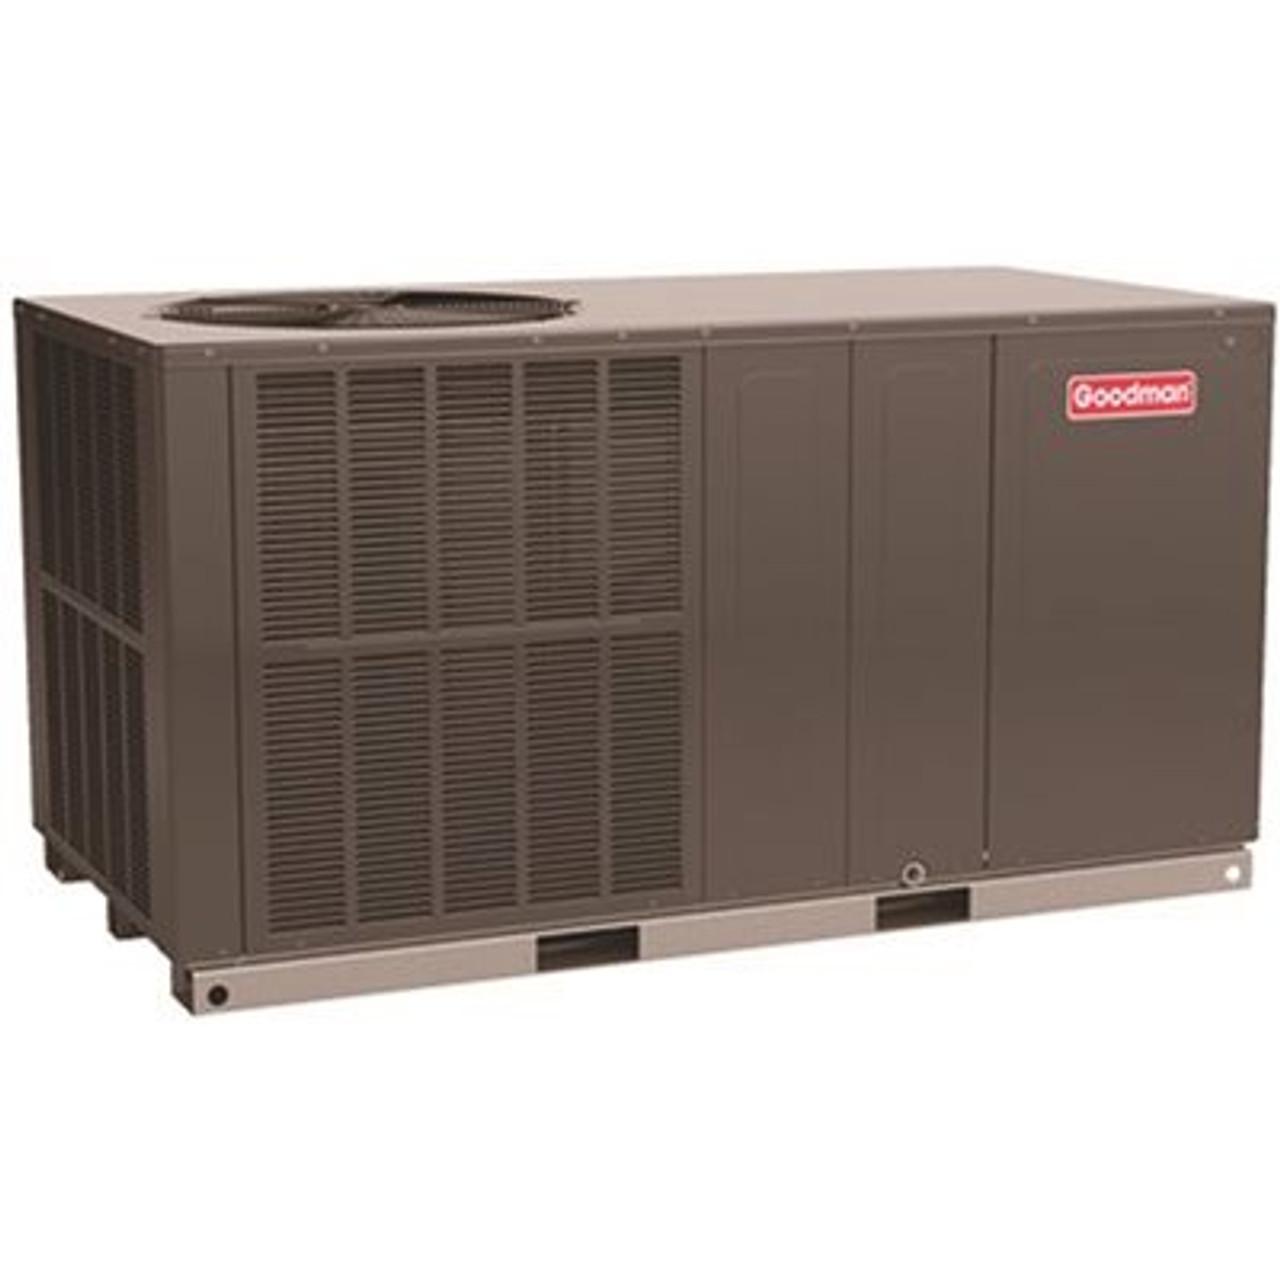 Goodman 2.5 Ton 28,400 BTU Packaged Terminal Air Conditioning Item # 2481271|Goodman Part # GPC1430H41|UPC Code 663051524774|UNSPSC Code 40101704